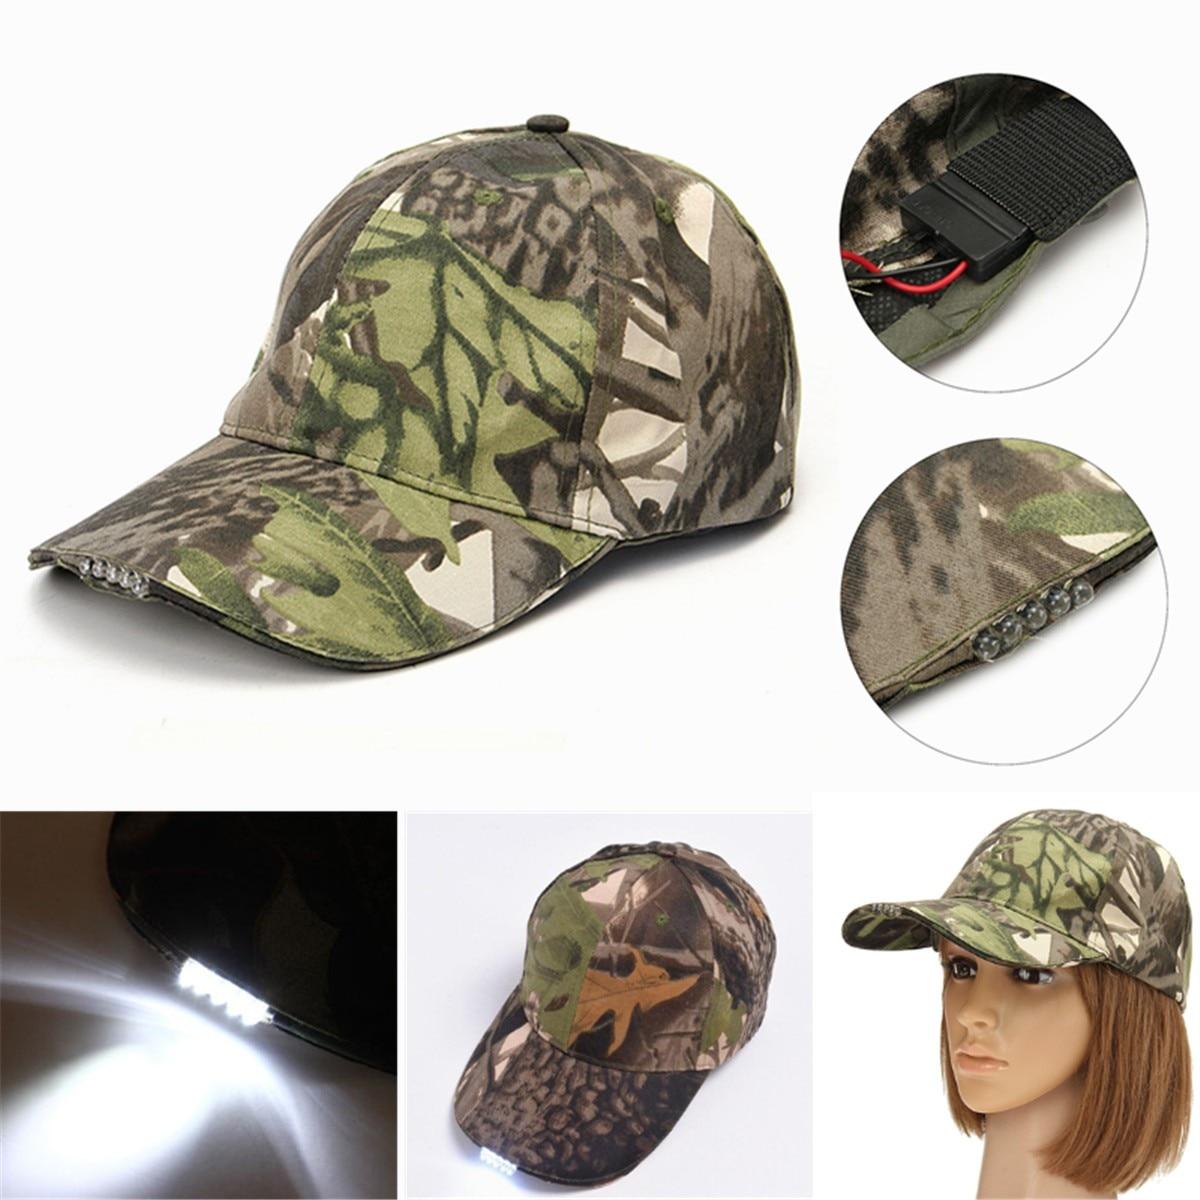 Unisex 5 LED Headlamp Cap Battery Powered Hat With LED Head Light Flashlight Head Lamp Lantern For Fishing Jogging Baseball Cap